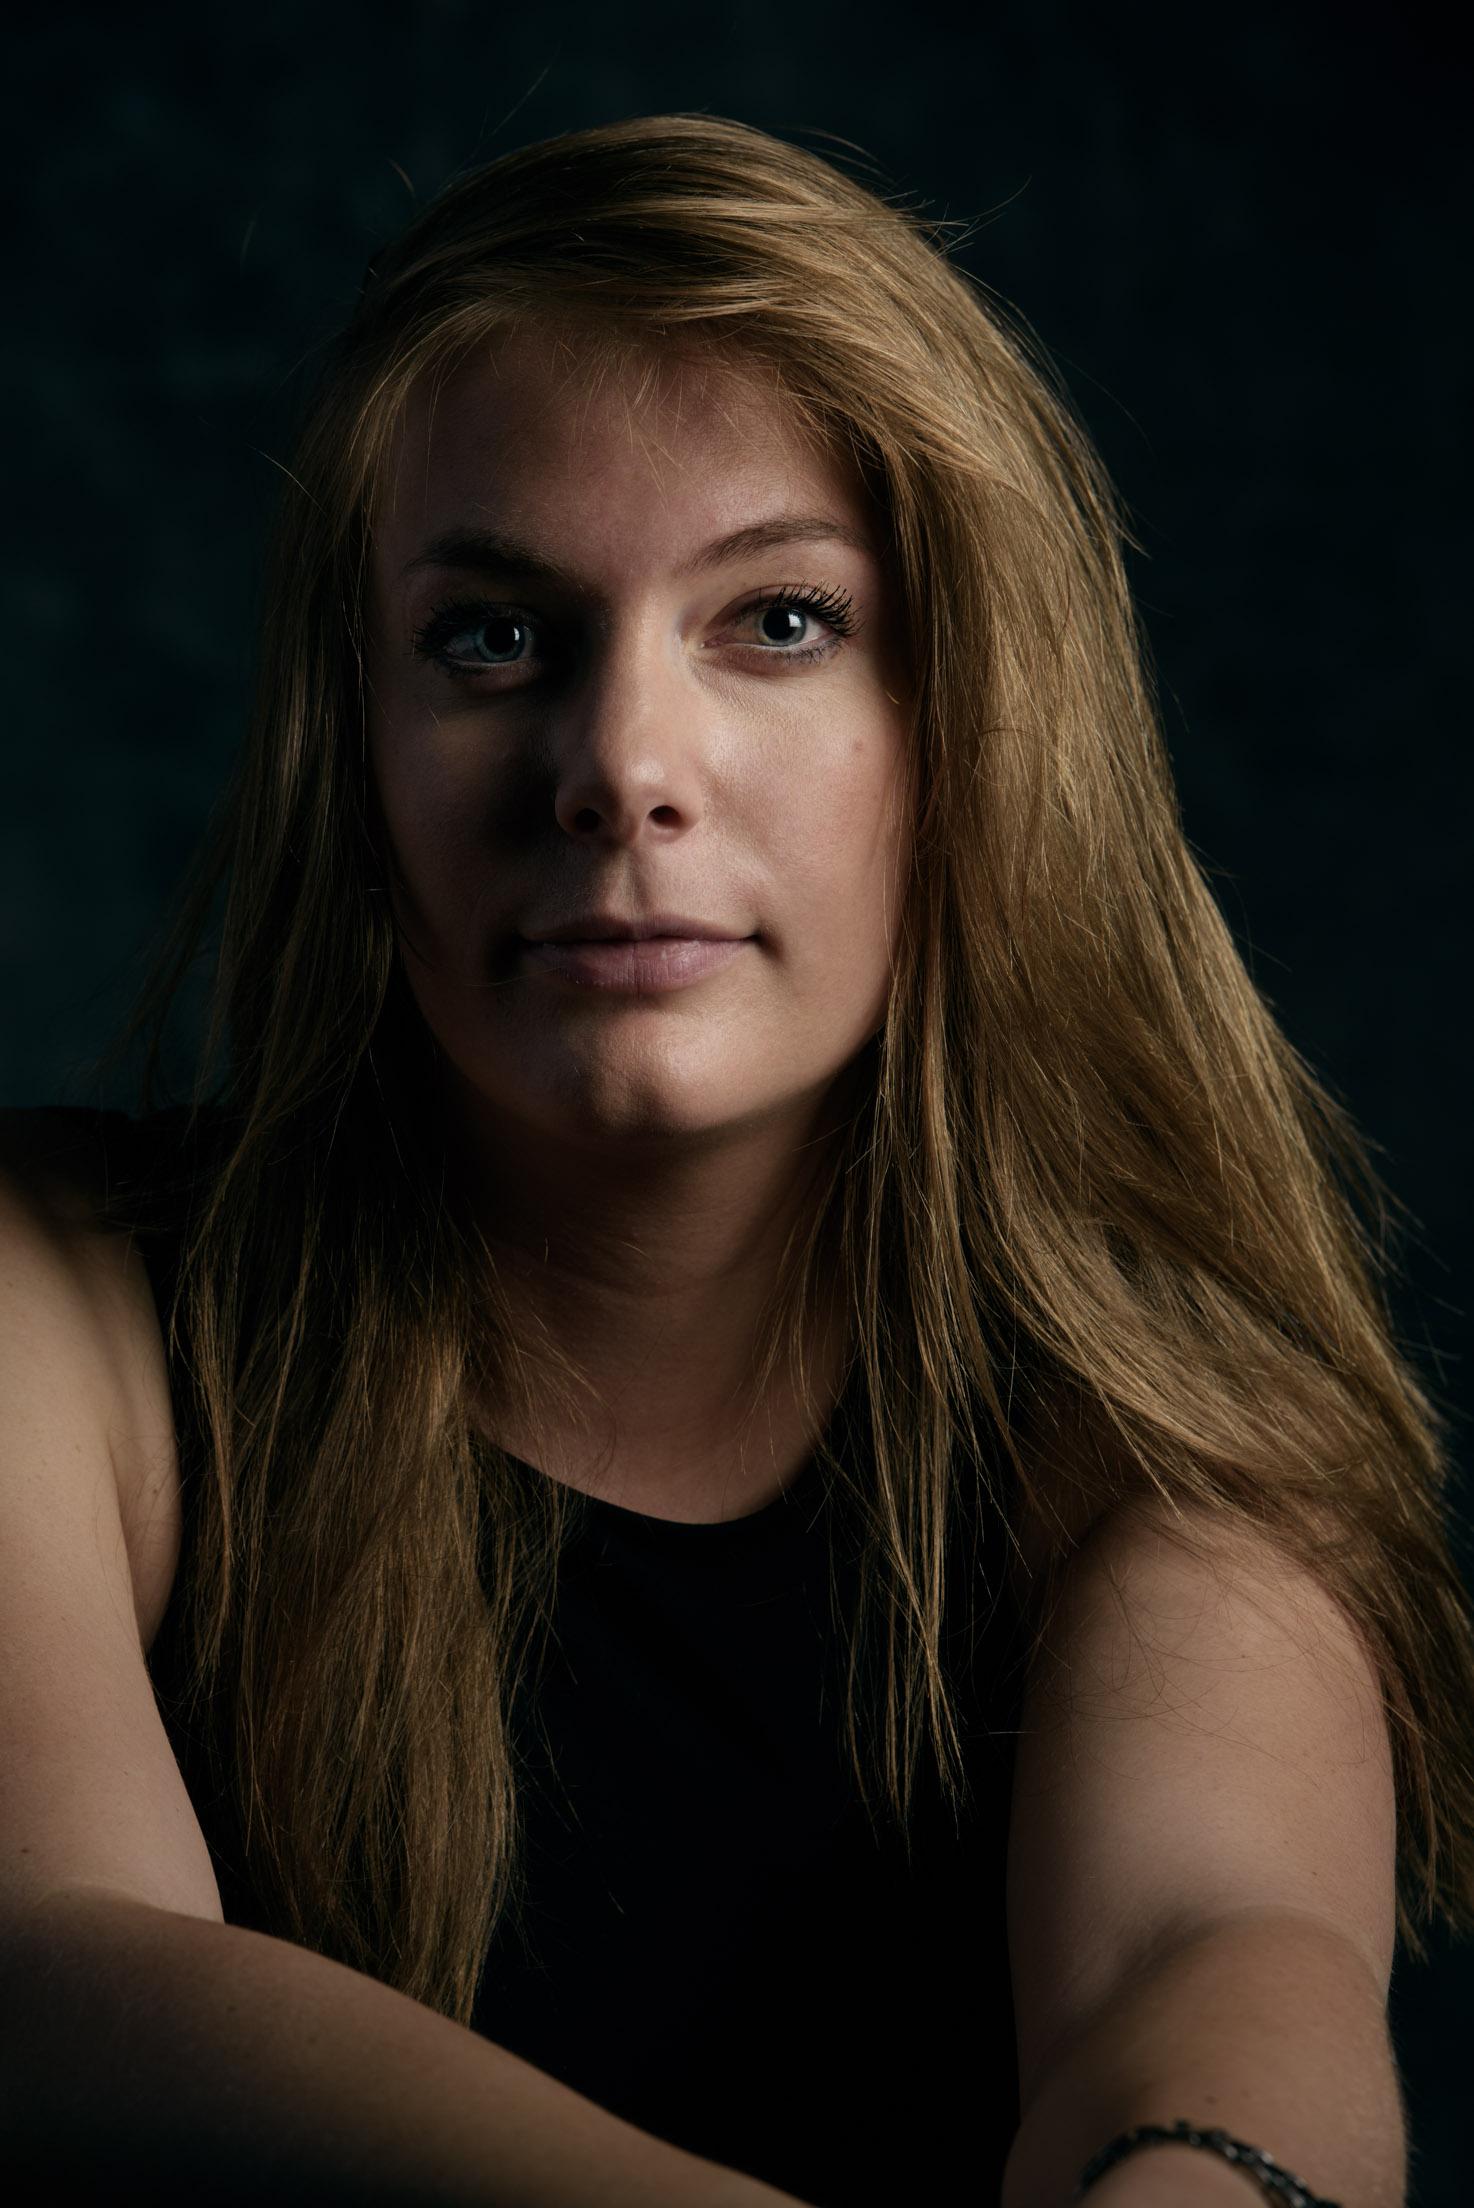 PortraitAlexandra-web-1.jpg